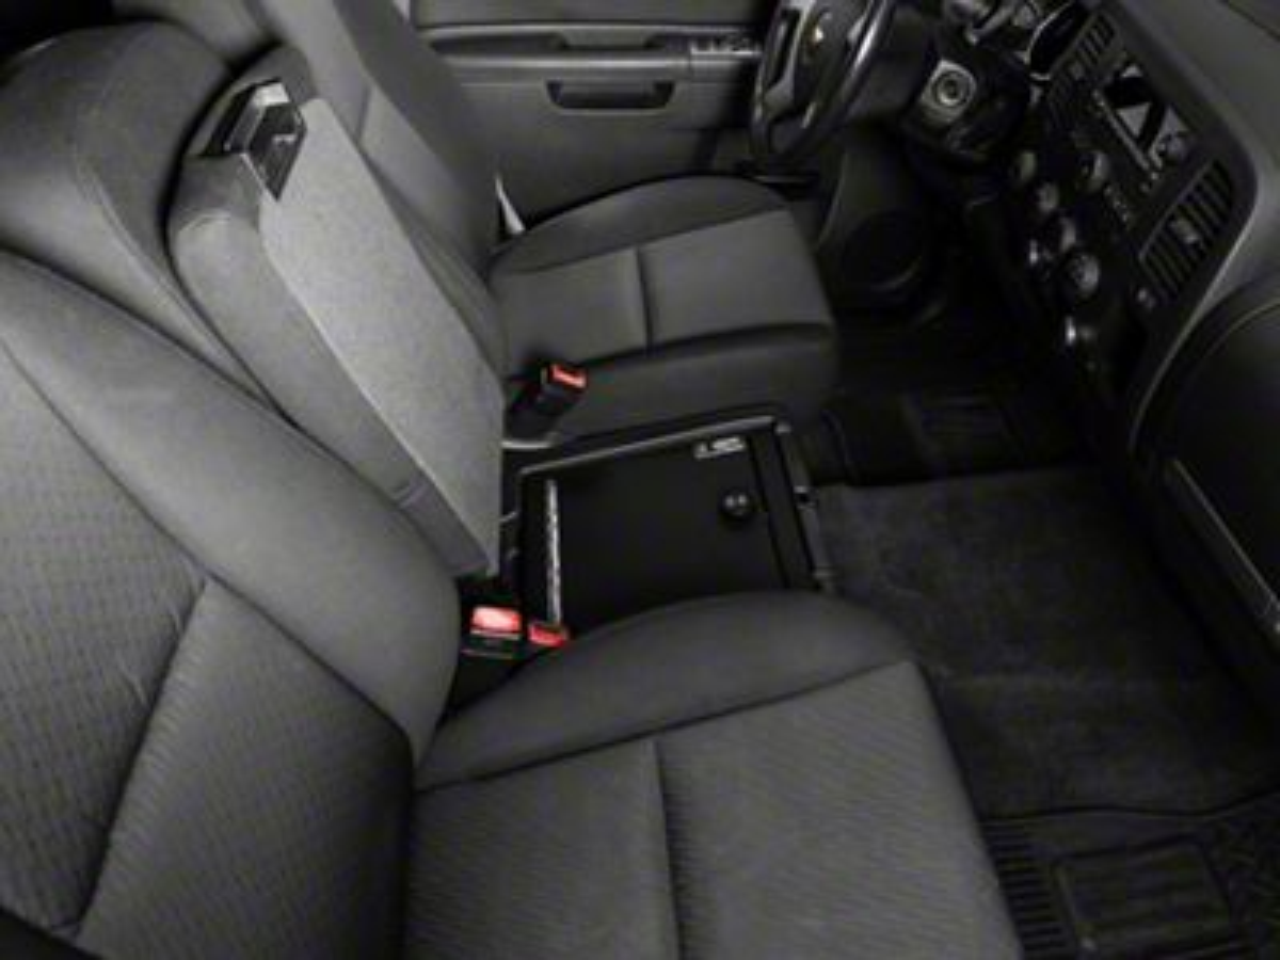 Lock'er Down Console Safe (07-13 Silverado 1500 w/ Bench Seat)